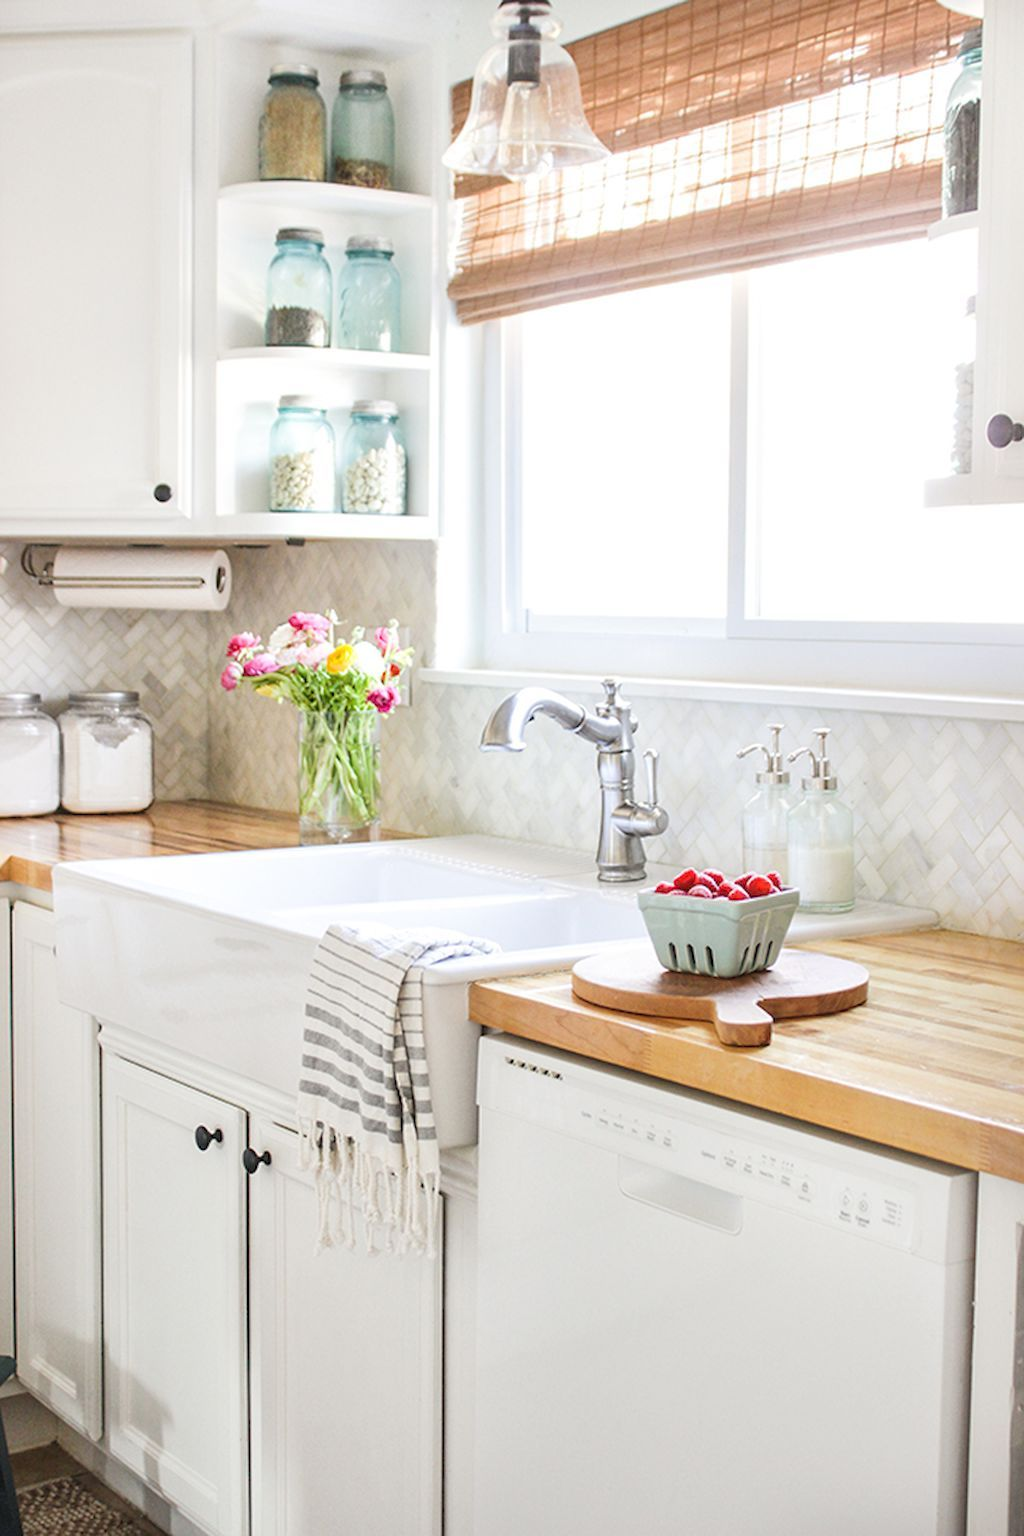 60 Affordable Farmhouse Kitchen Ideas On A Budget  Farmhouse Stunning Kitchen Designs On A Budget Design Decoration